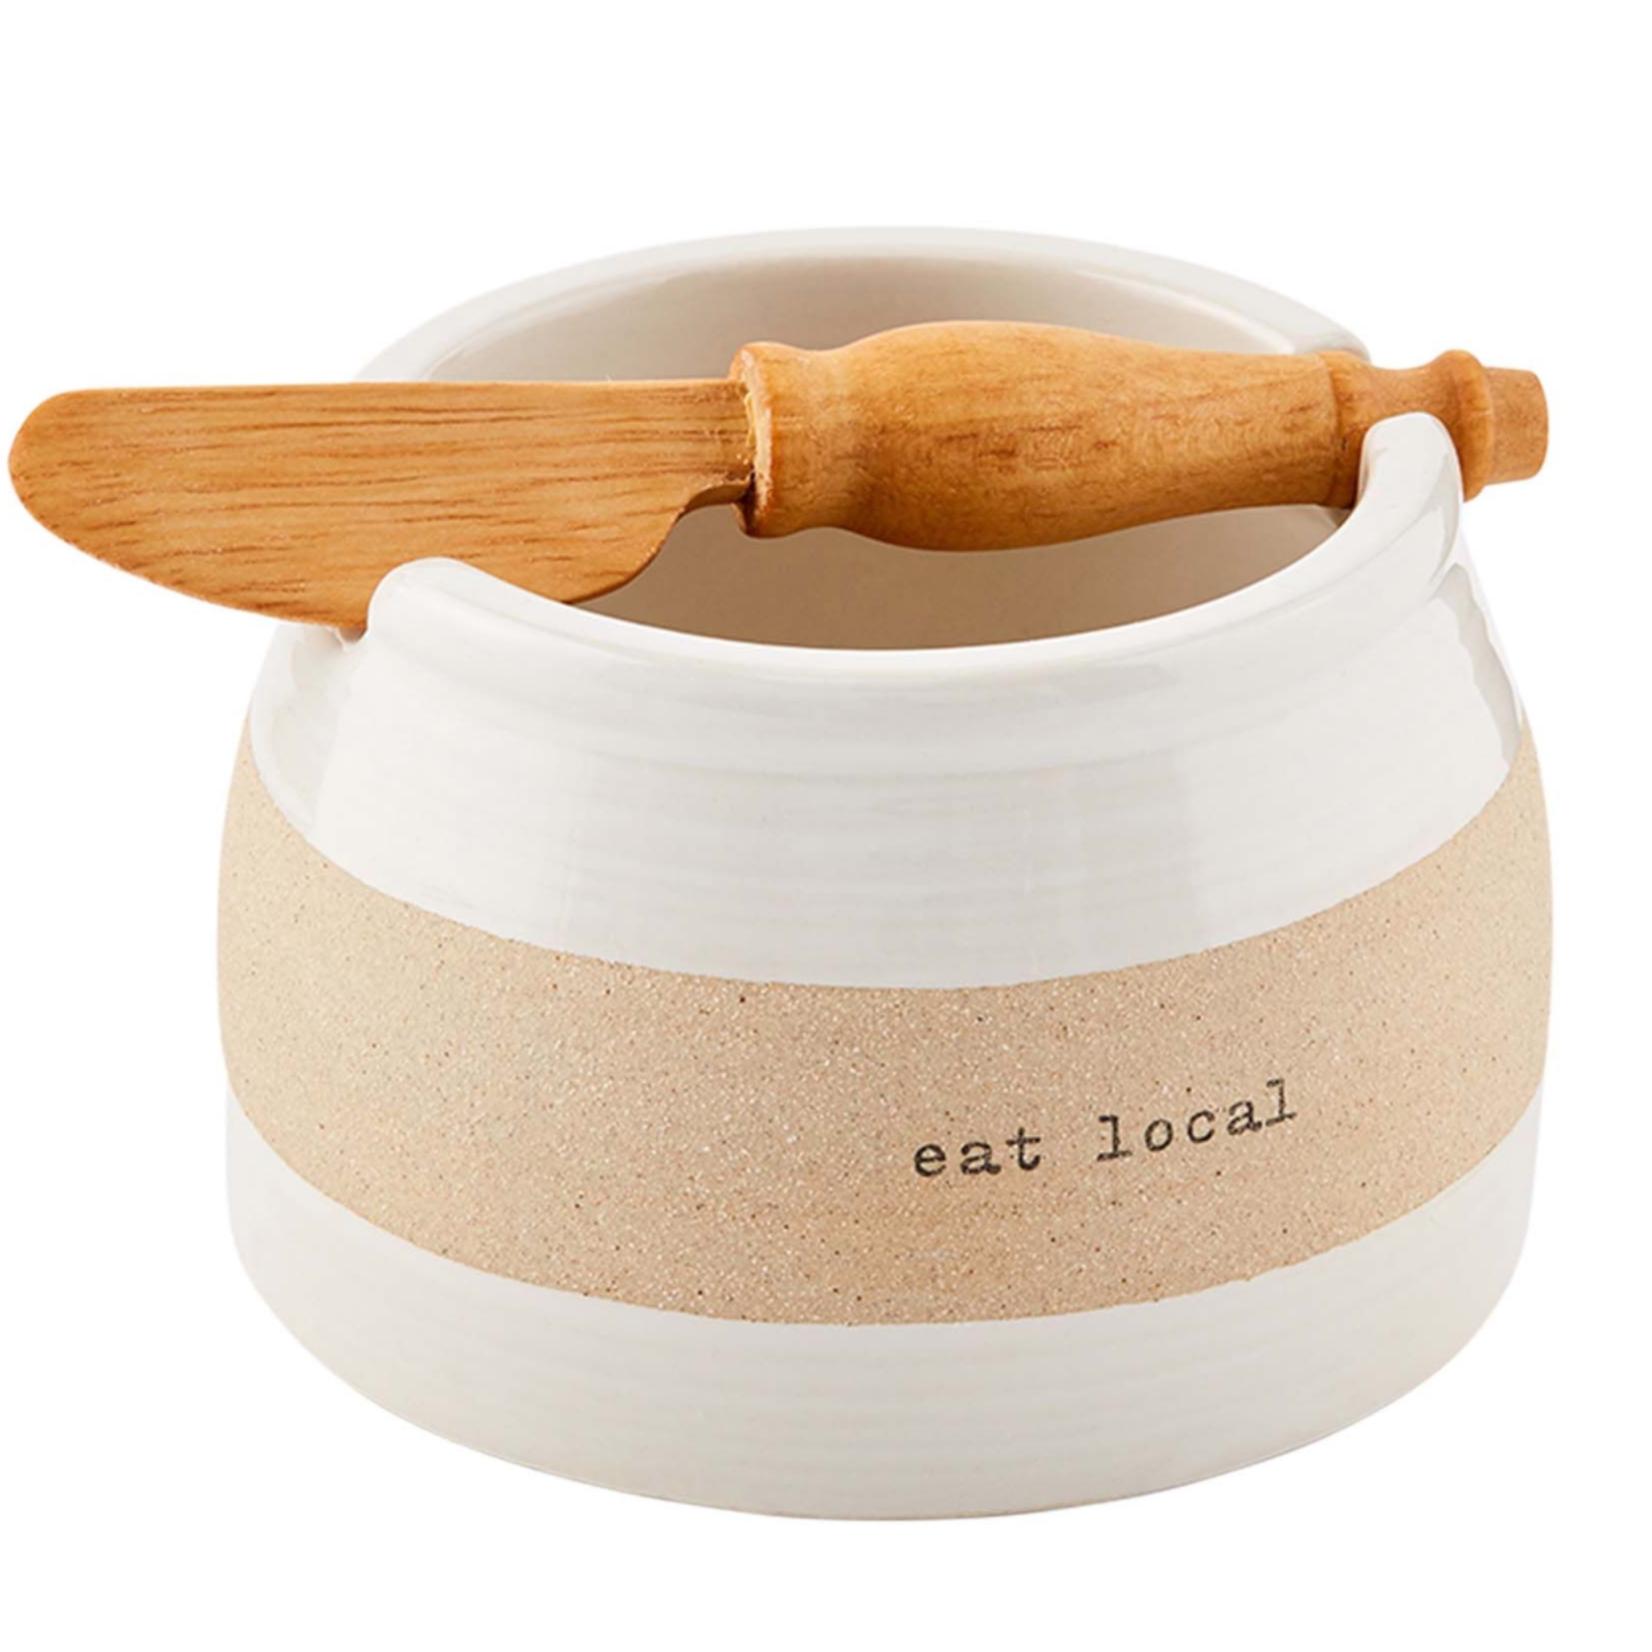 mud pie Stoneware Dip Bowl Set